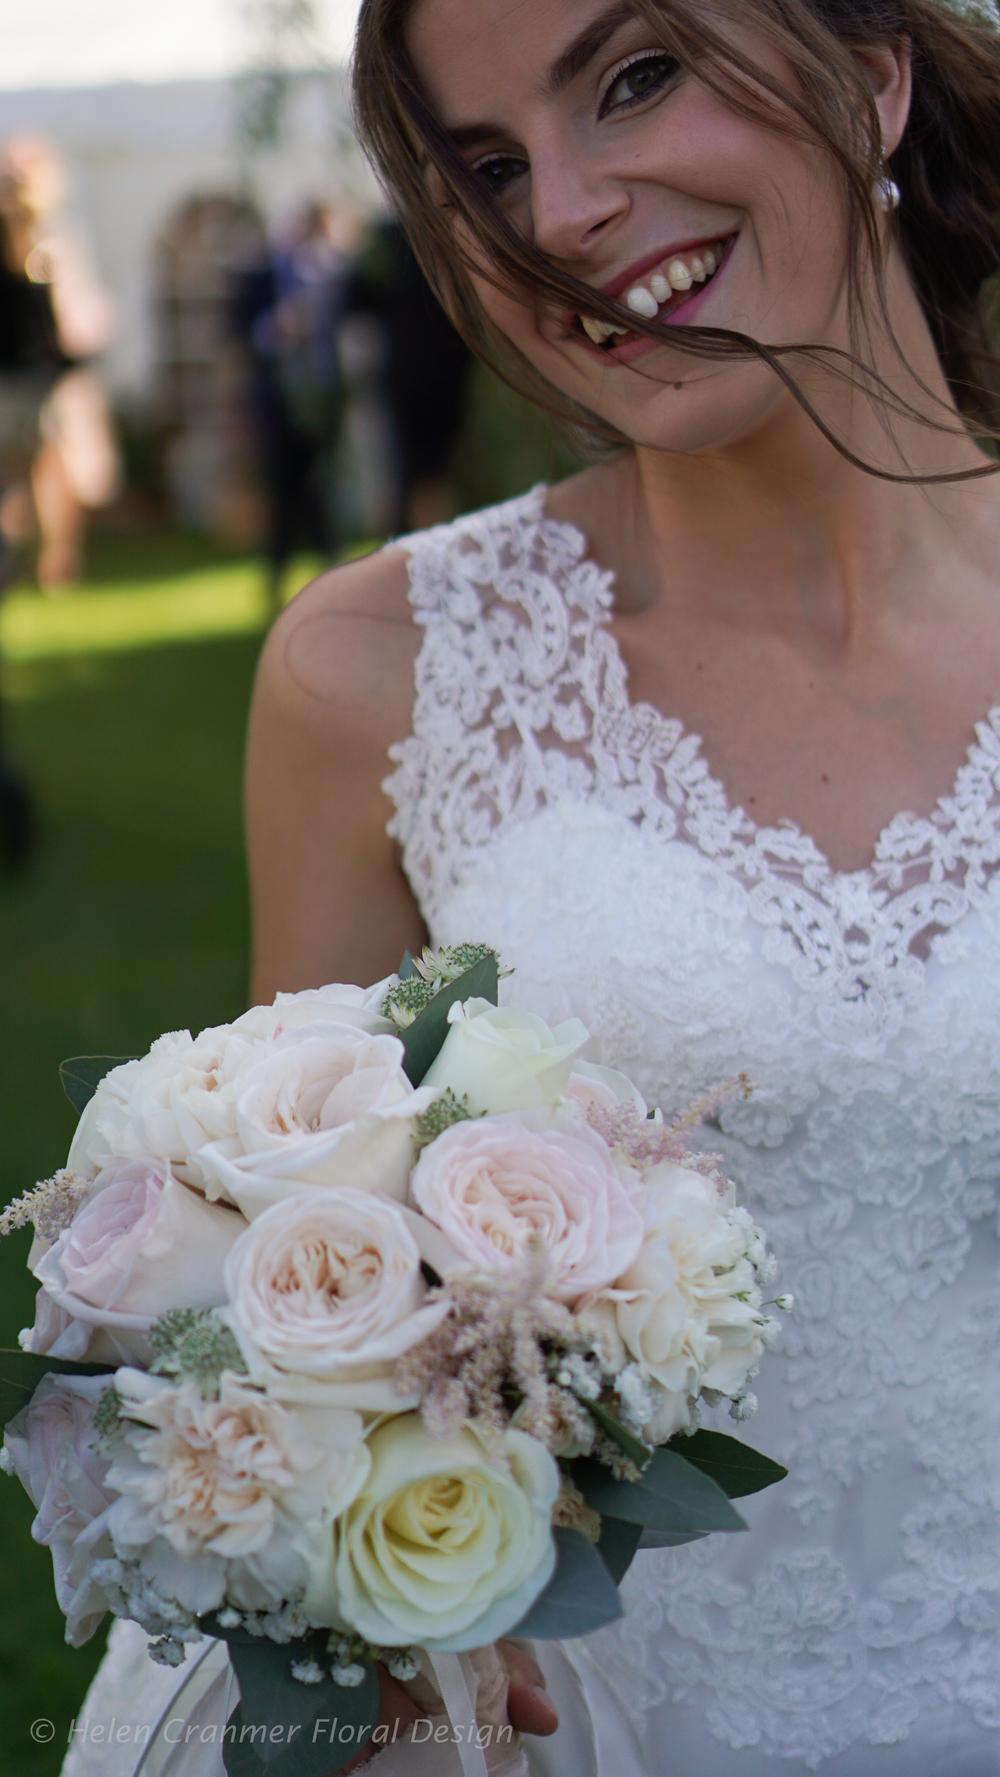 September flowers weddings (37 of 40).jpg